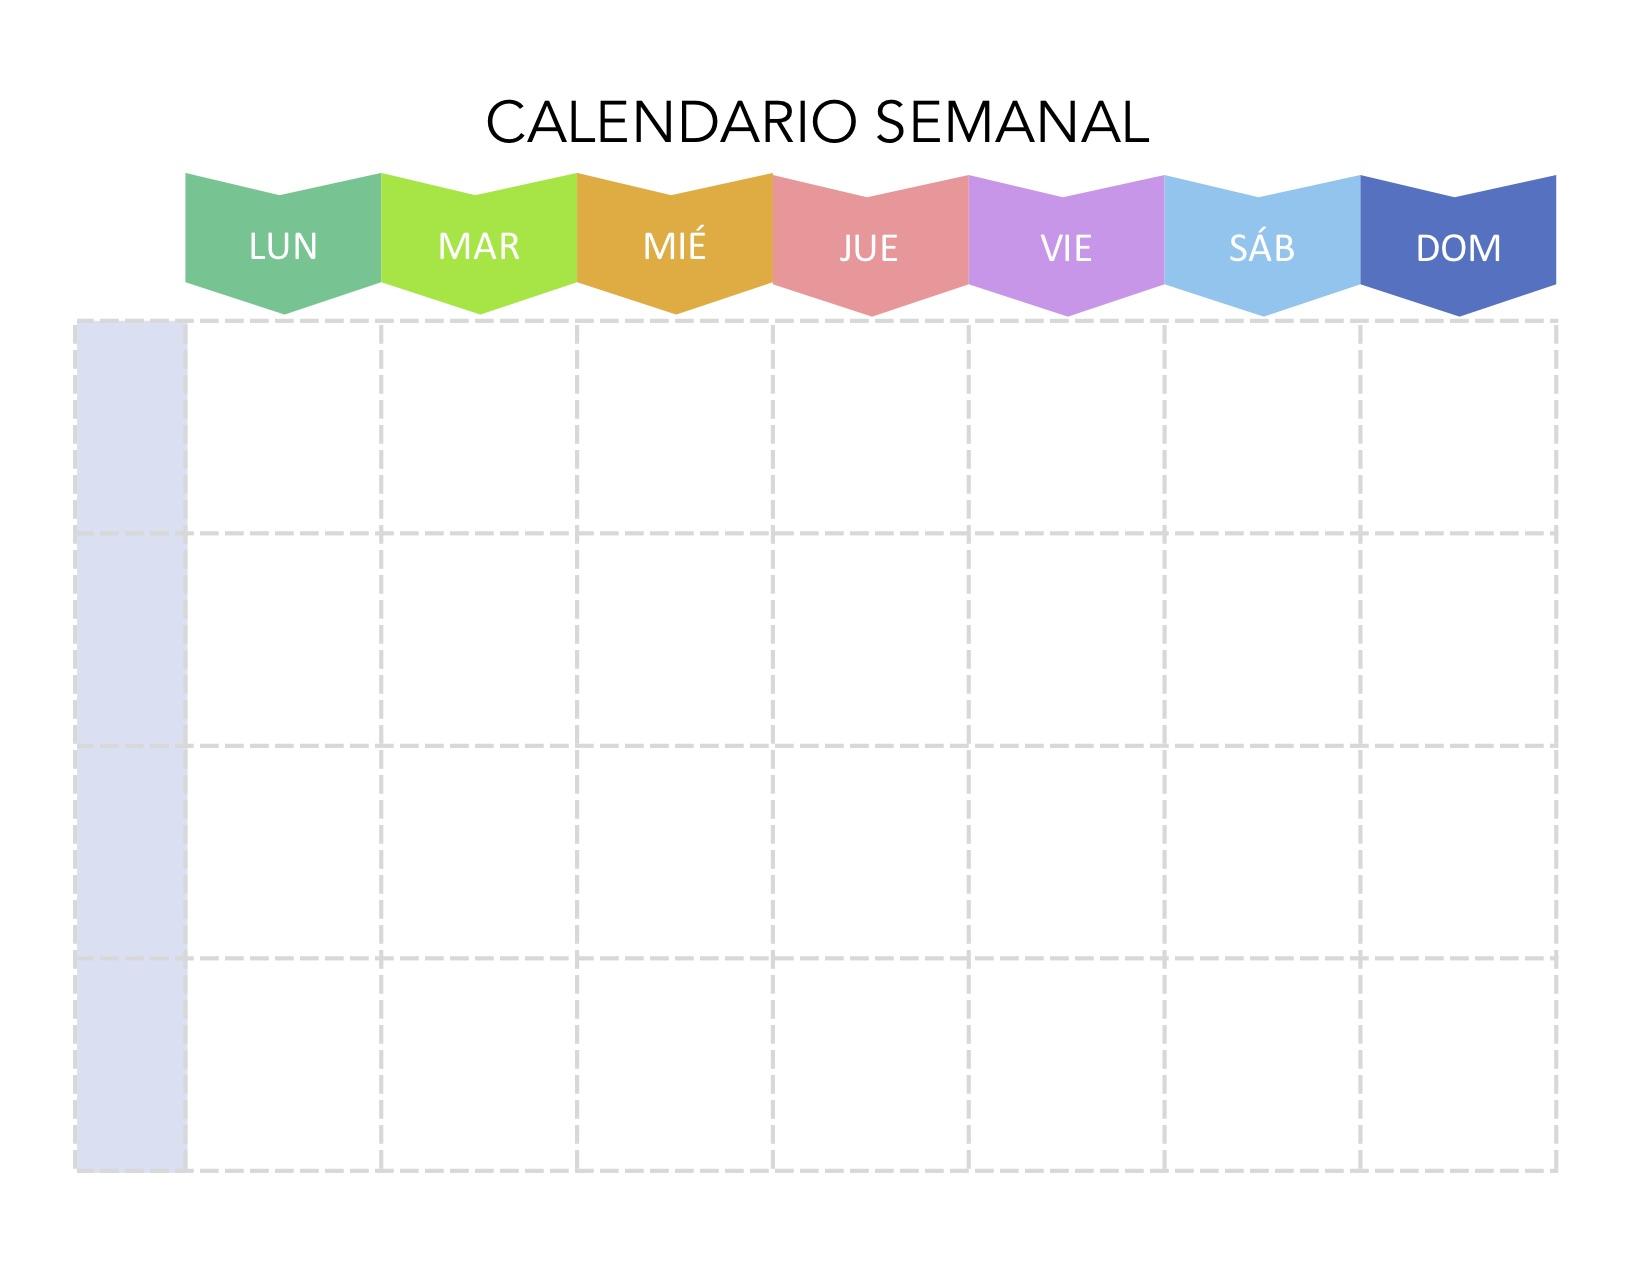 Calendario Semanal Para Imprimir Ano 2020